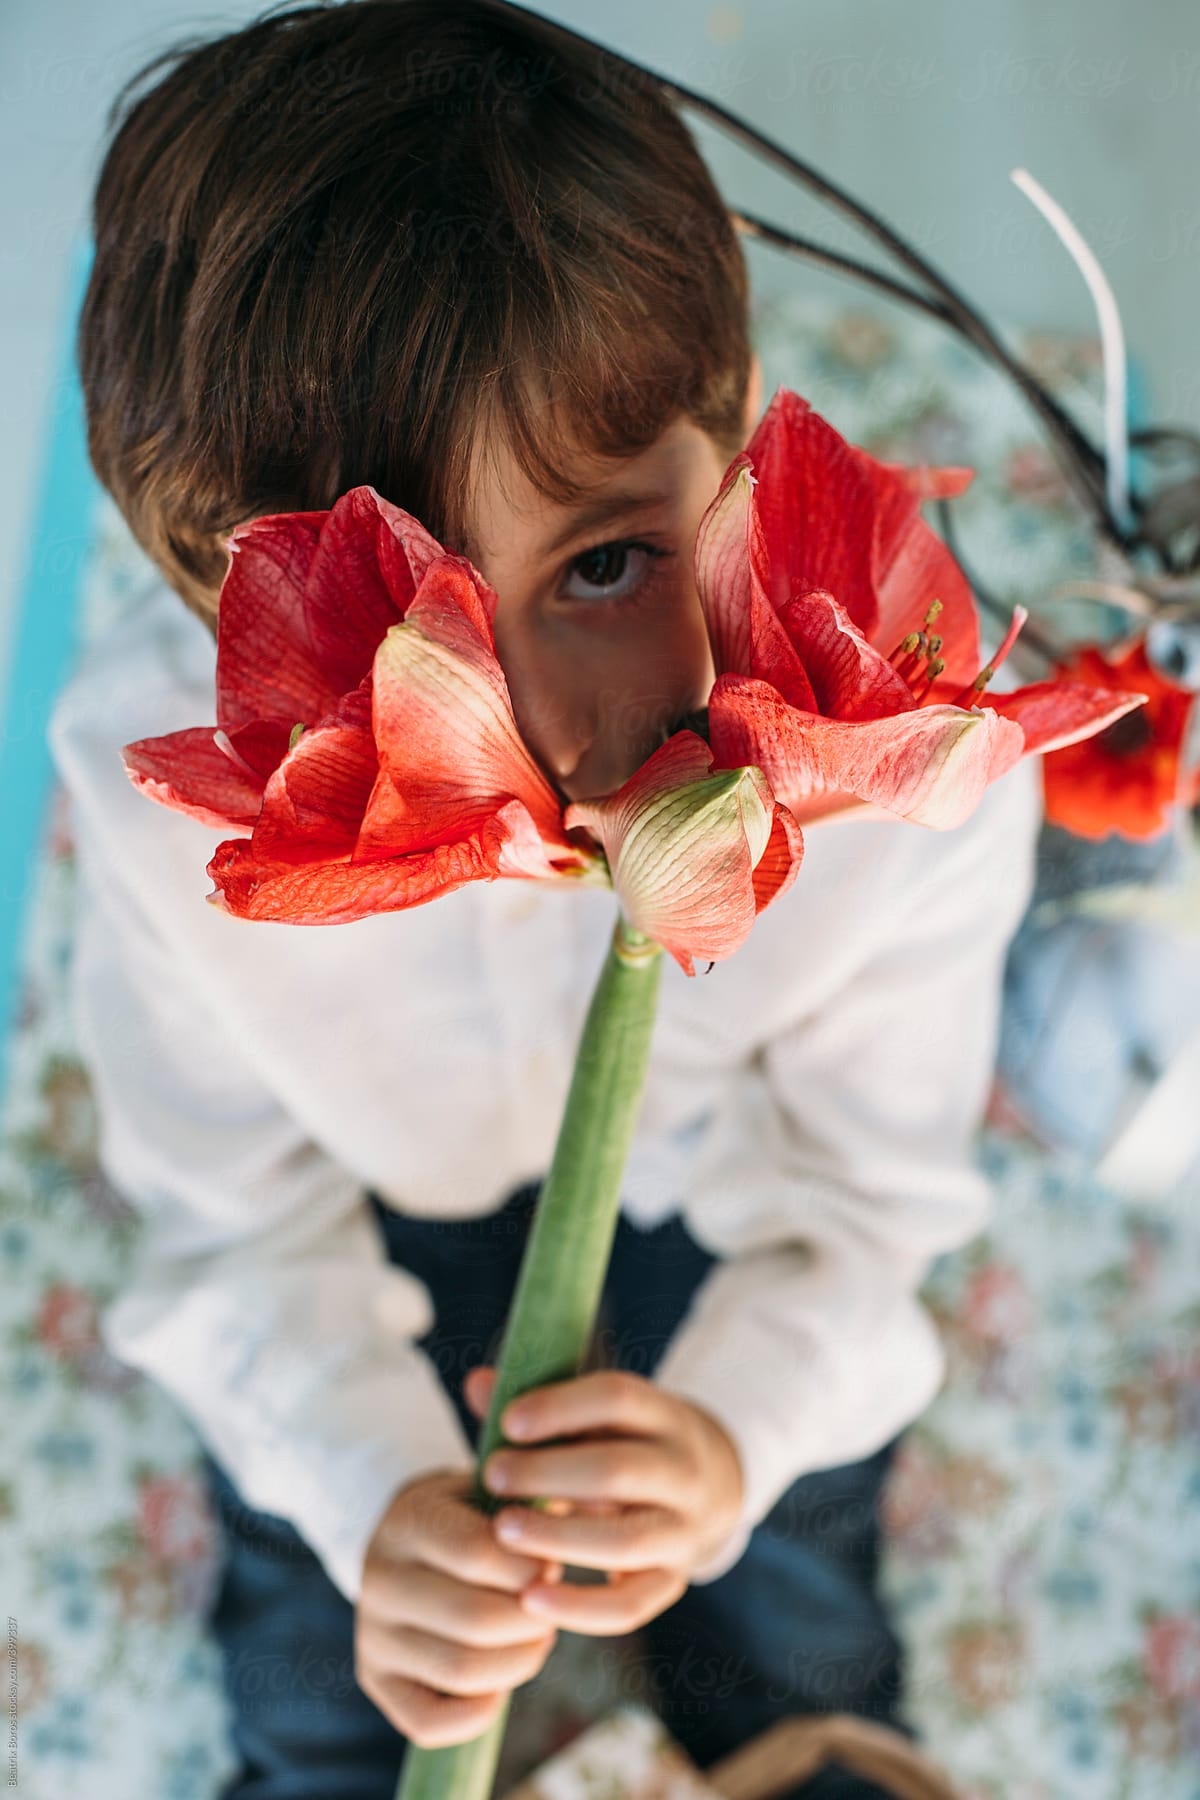 6 years old boy hiding behind a beautiful flower stocksy united 6 years old boy hiding behind a beautiful flower by beatrix boros for stocksy united izmirmasajfo